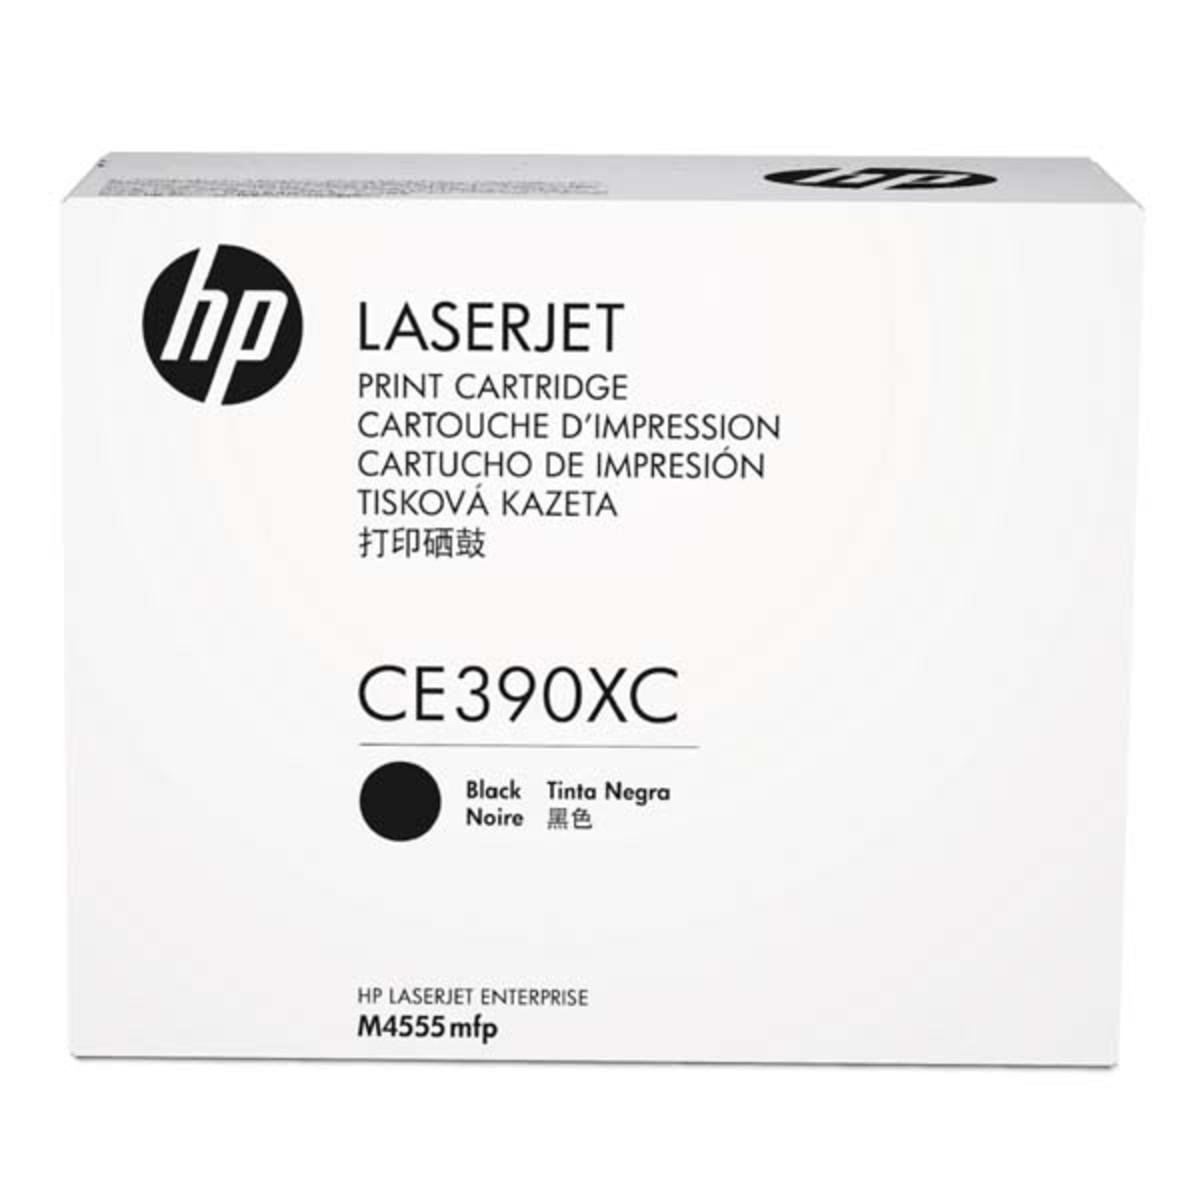 HP 90X (CE390XC) Black Contract Toner Cartridge - High Yield